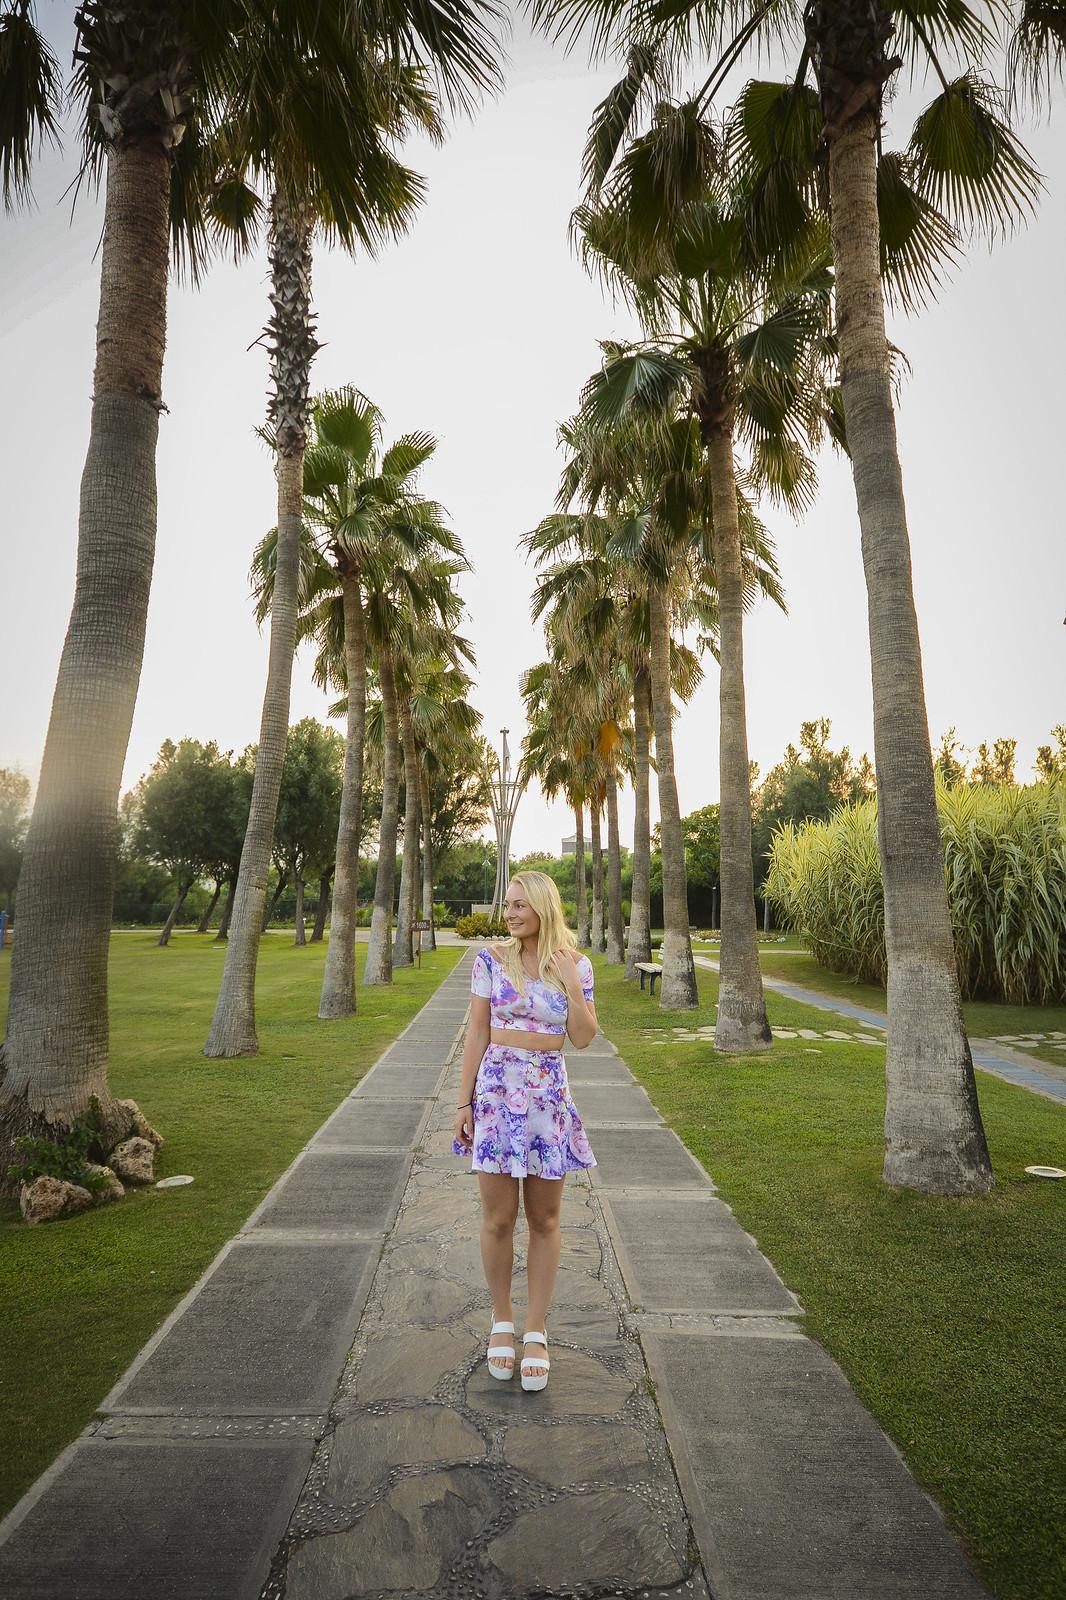 palmtrees_3